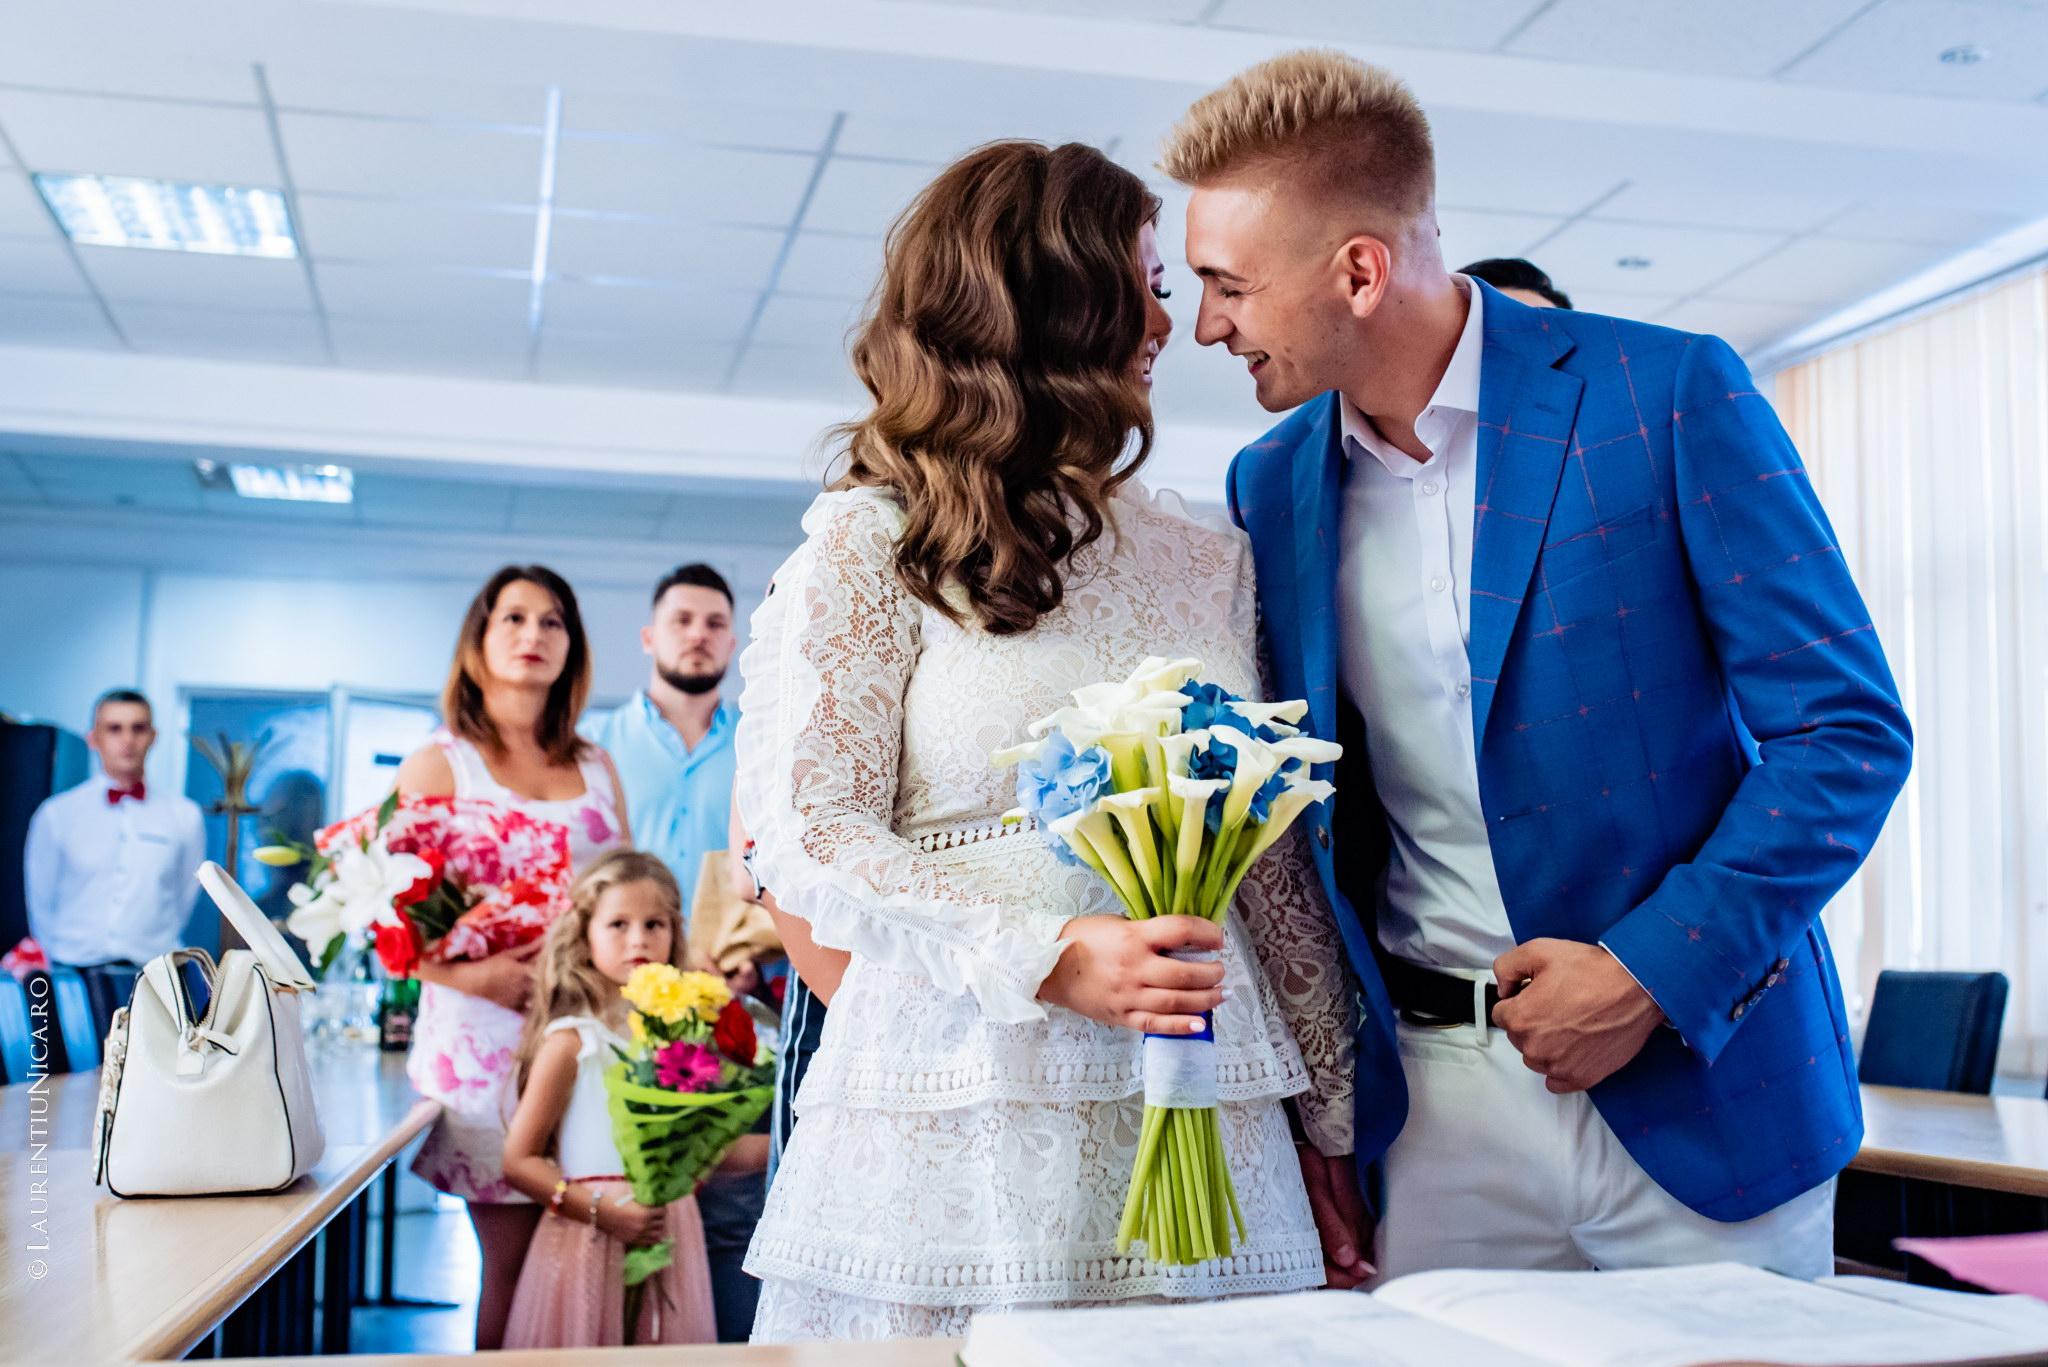 fotografii nunta Roxana si Cosmin fotograf nunta laurentiu nica 02 - Roxana & Cosmin | Fotografii nunta | Ticleni, judetul Gorj